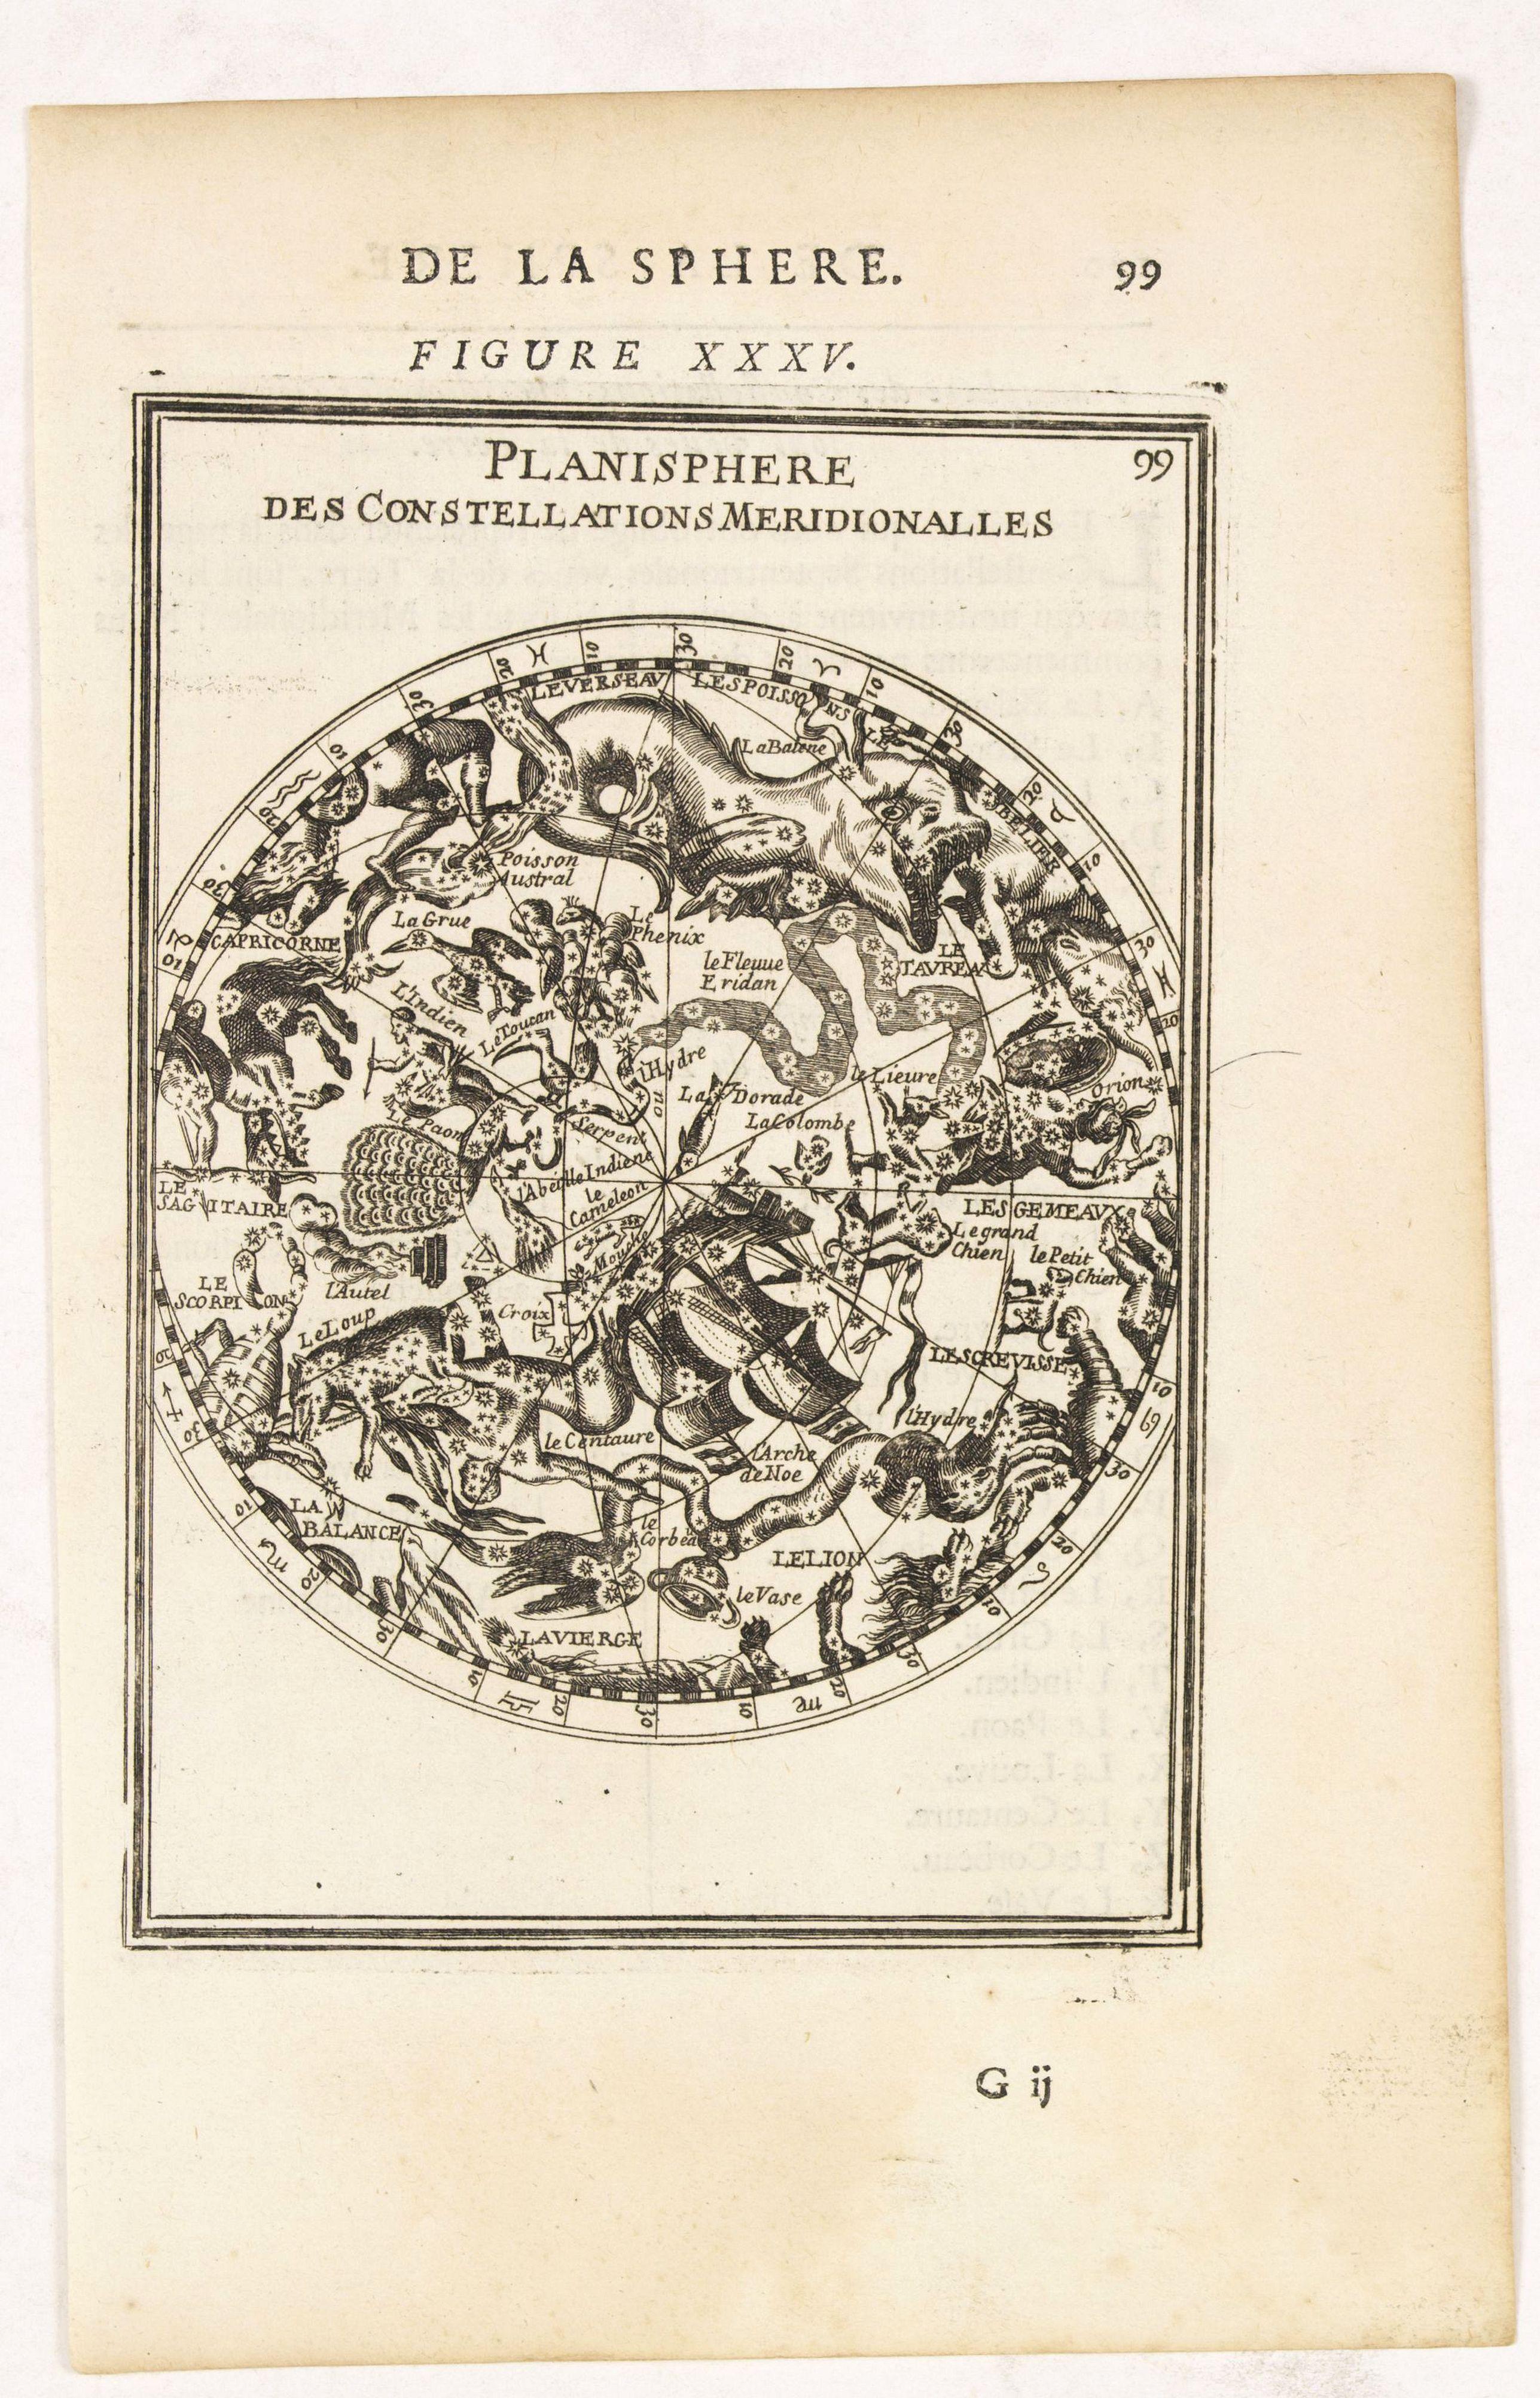 MALLET,A.M. -  Planisphere des Constellations Meridionalles. Figure XXXV.